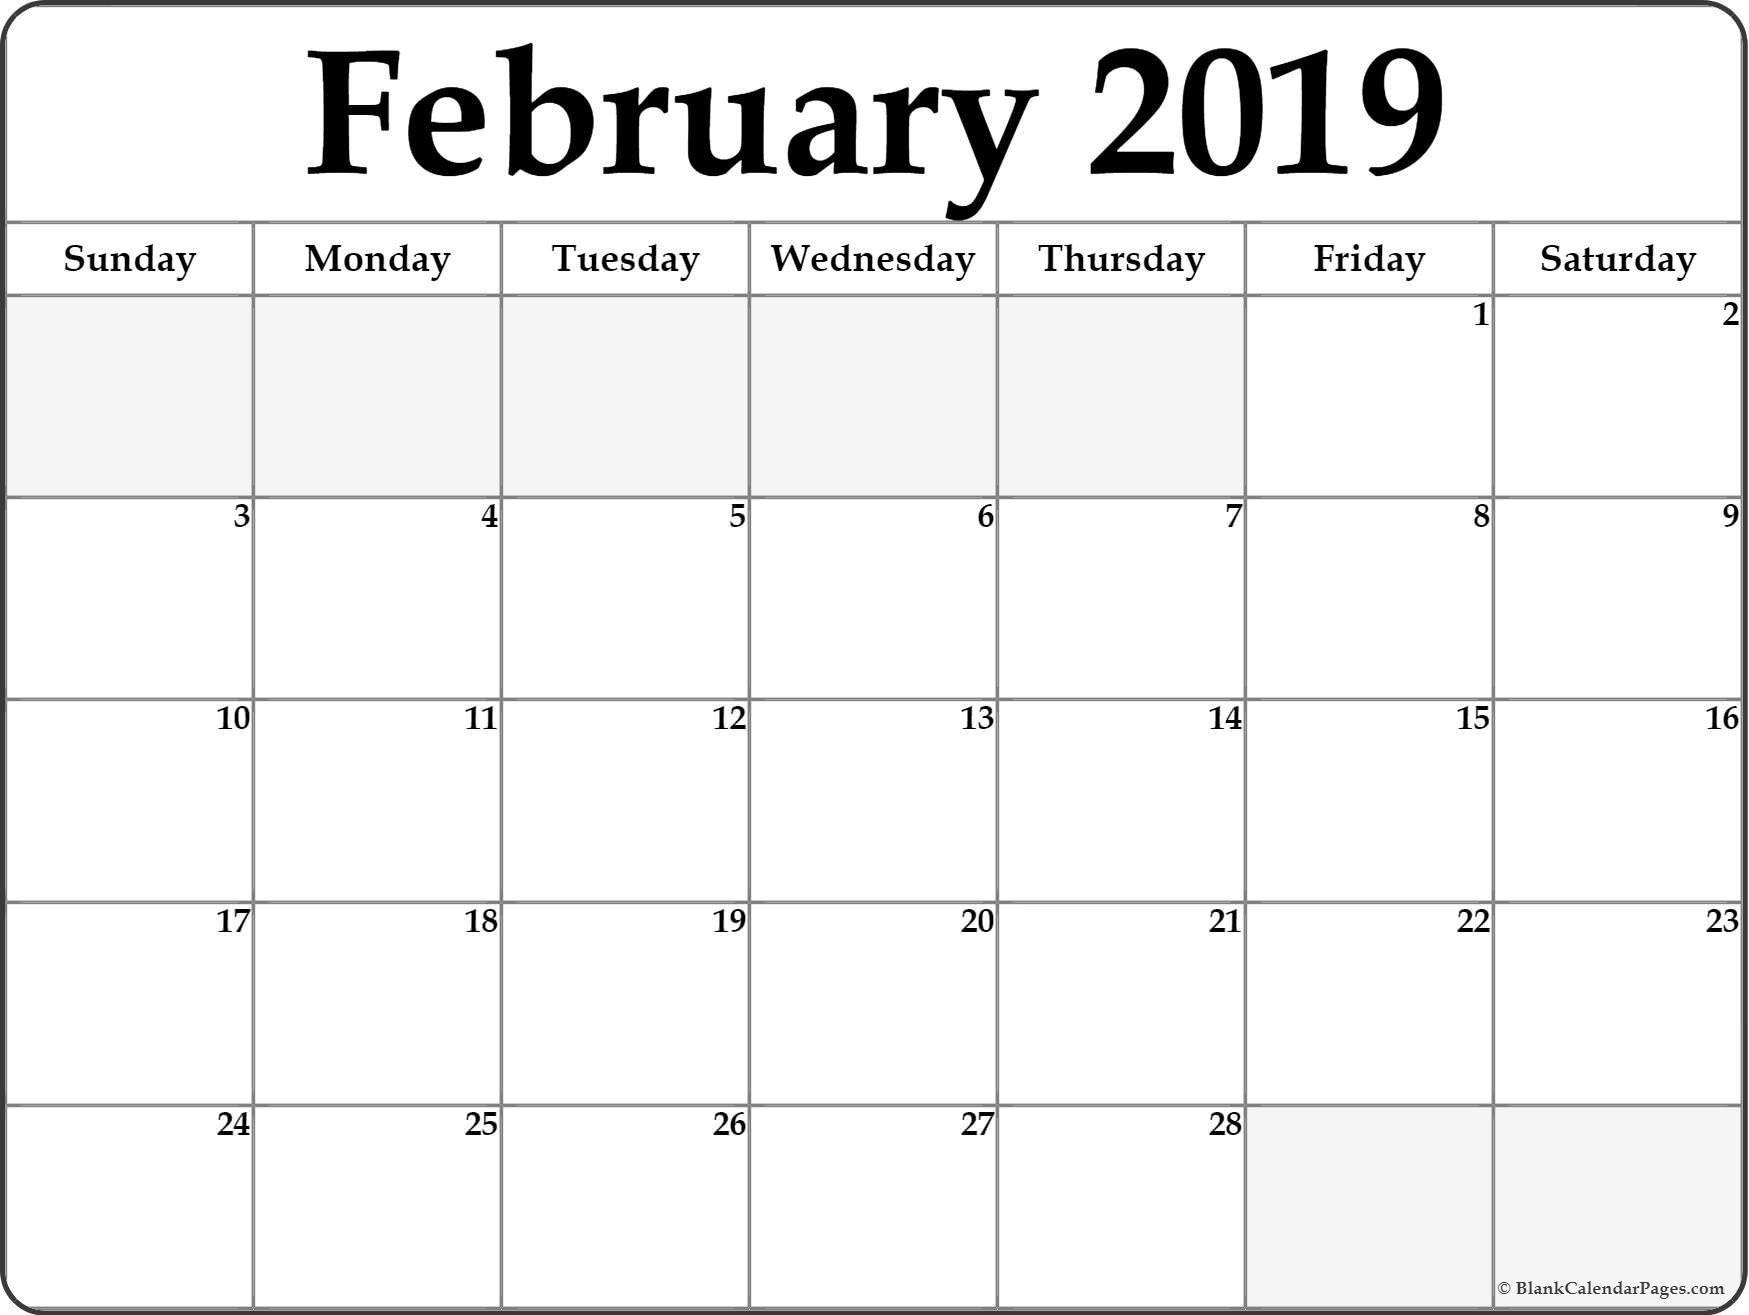 February 2019 Blank Calendar . February 2019 Calendar  February Blank Calendar Printable